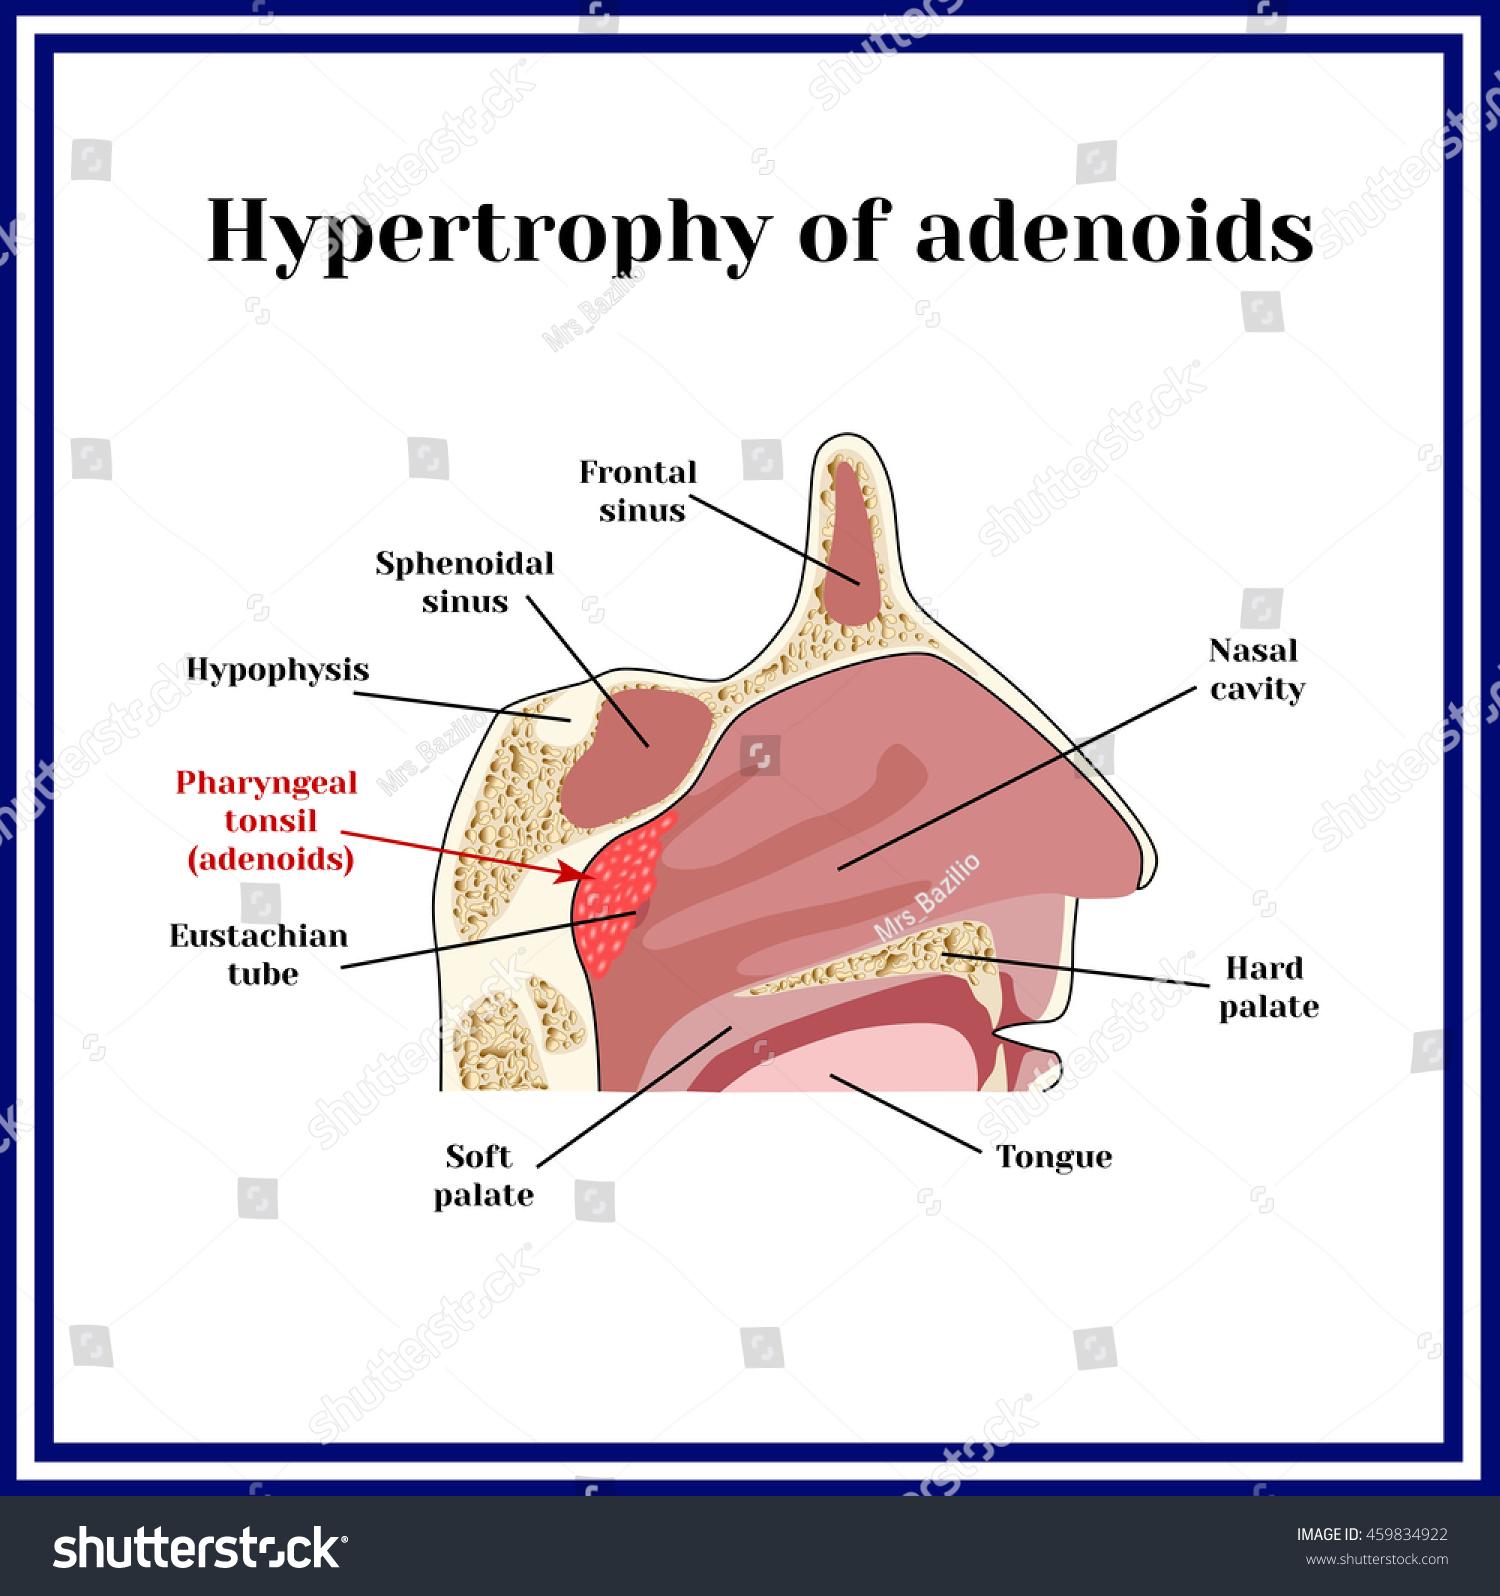 Location Adenoids Structure Nasopharynx Hypertrophy Adenoid Stock